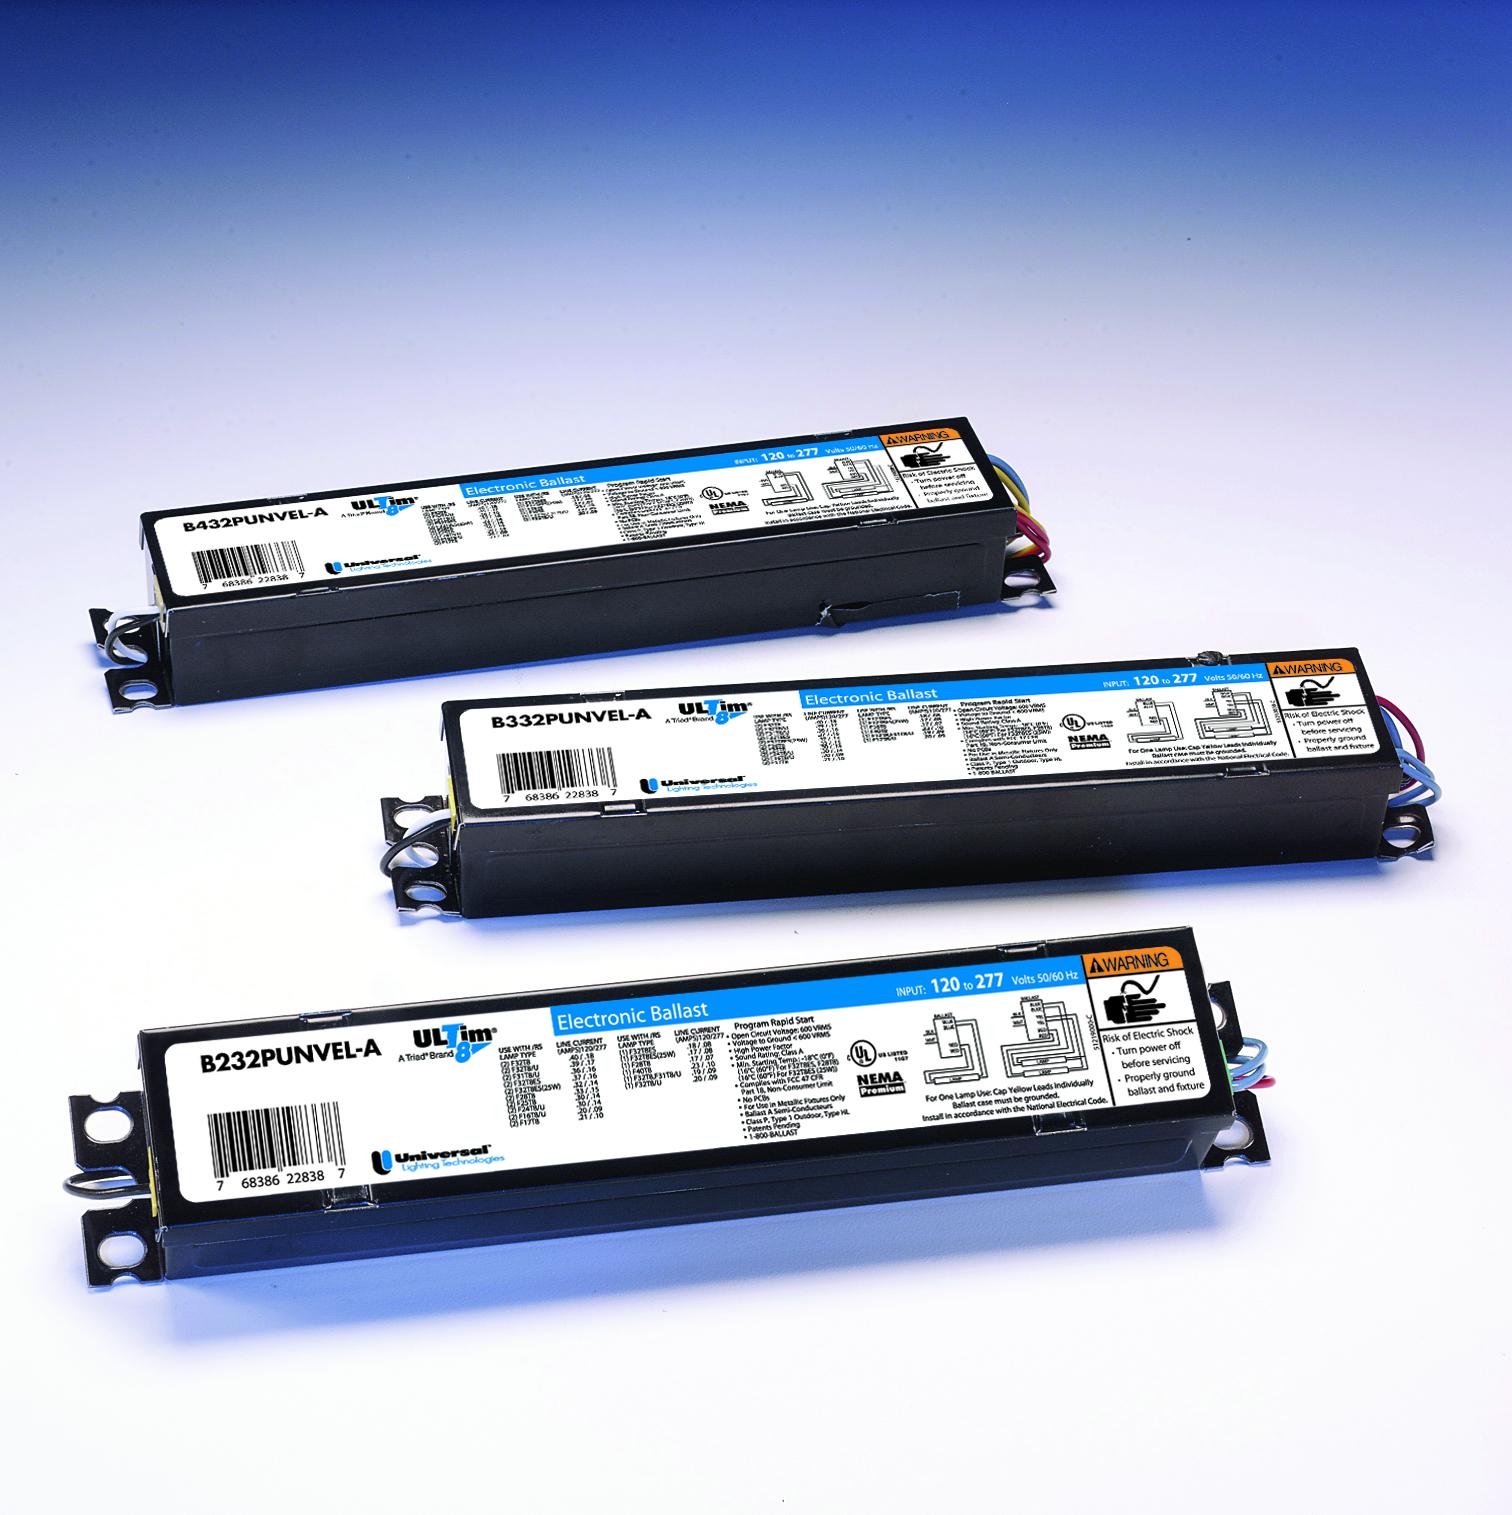 Universal Lighting Technologies B259IUNVHP-A000I UNIVERSAL LIGHTING TECH B259IUNVHPA000I